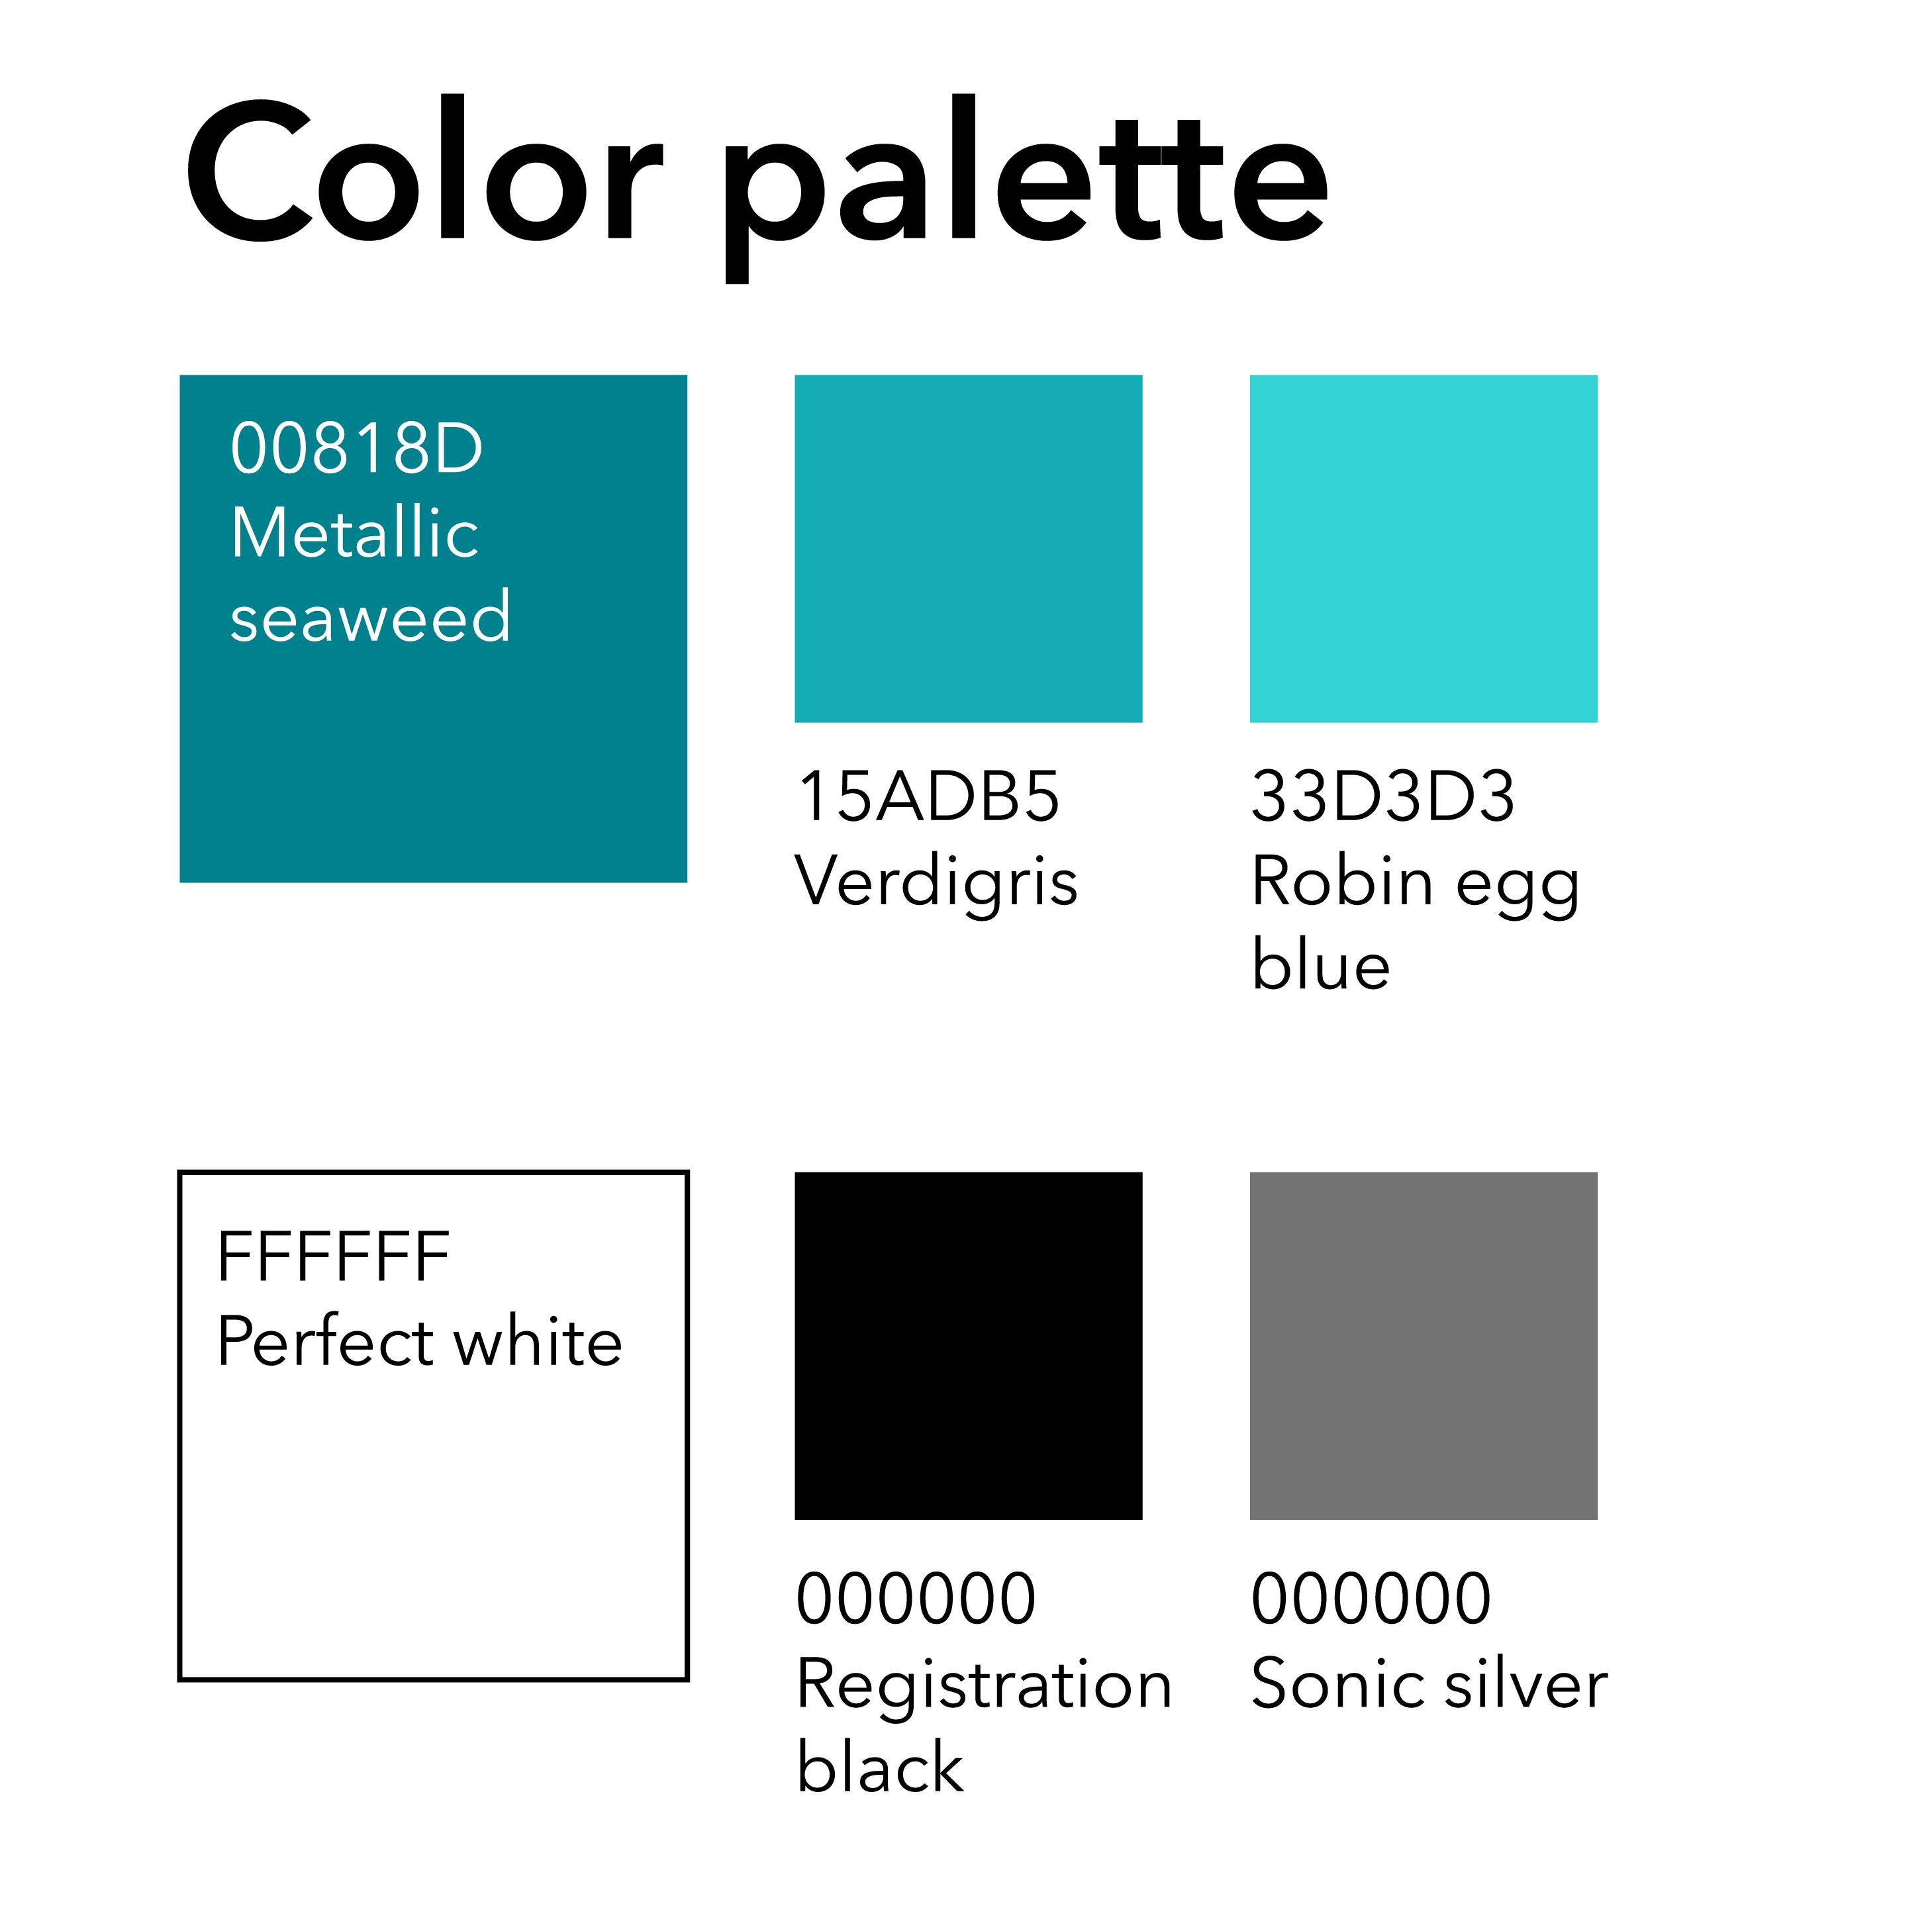 colorpalette-evofit-02